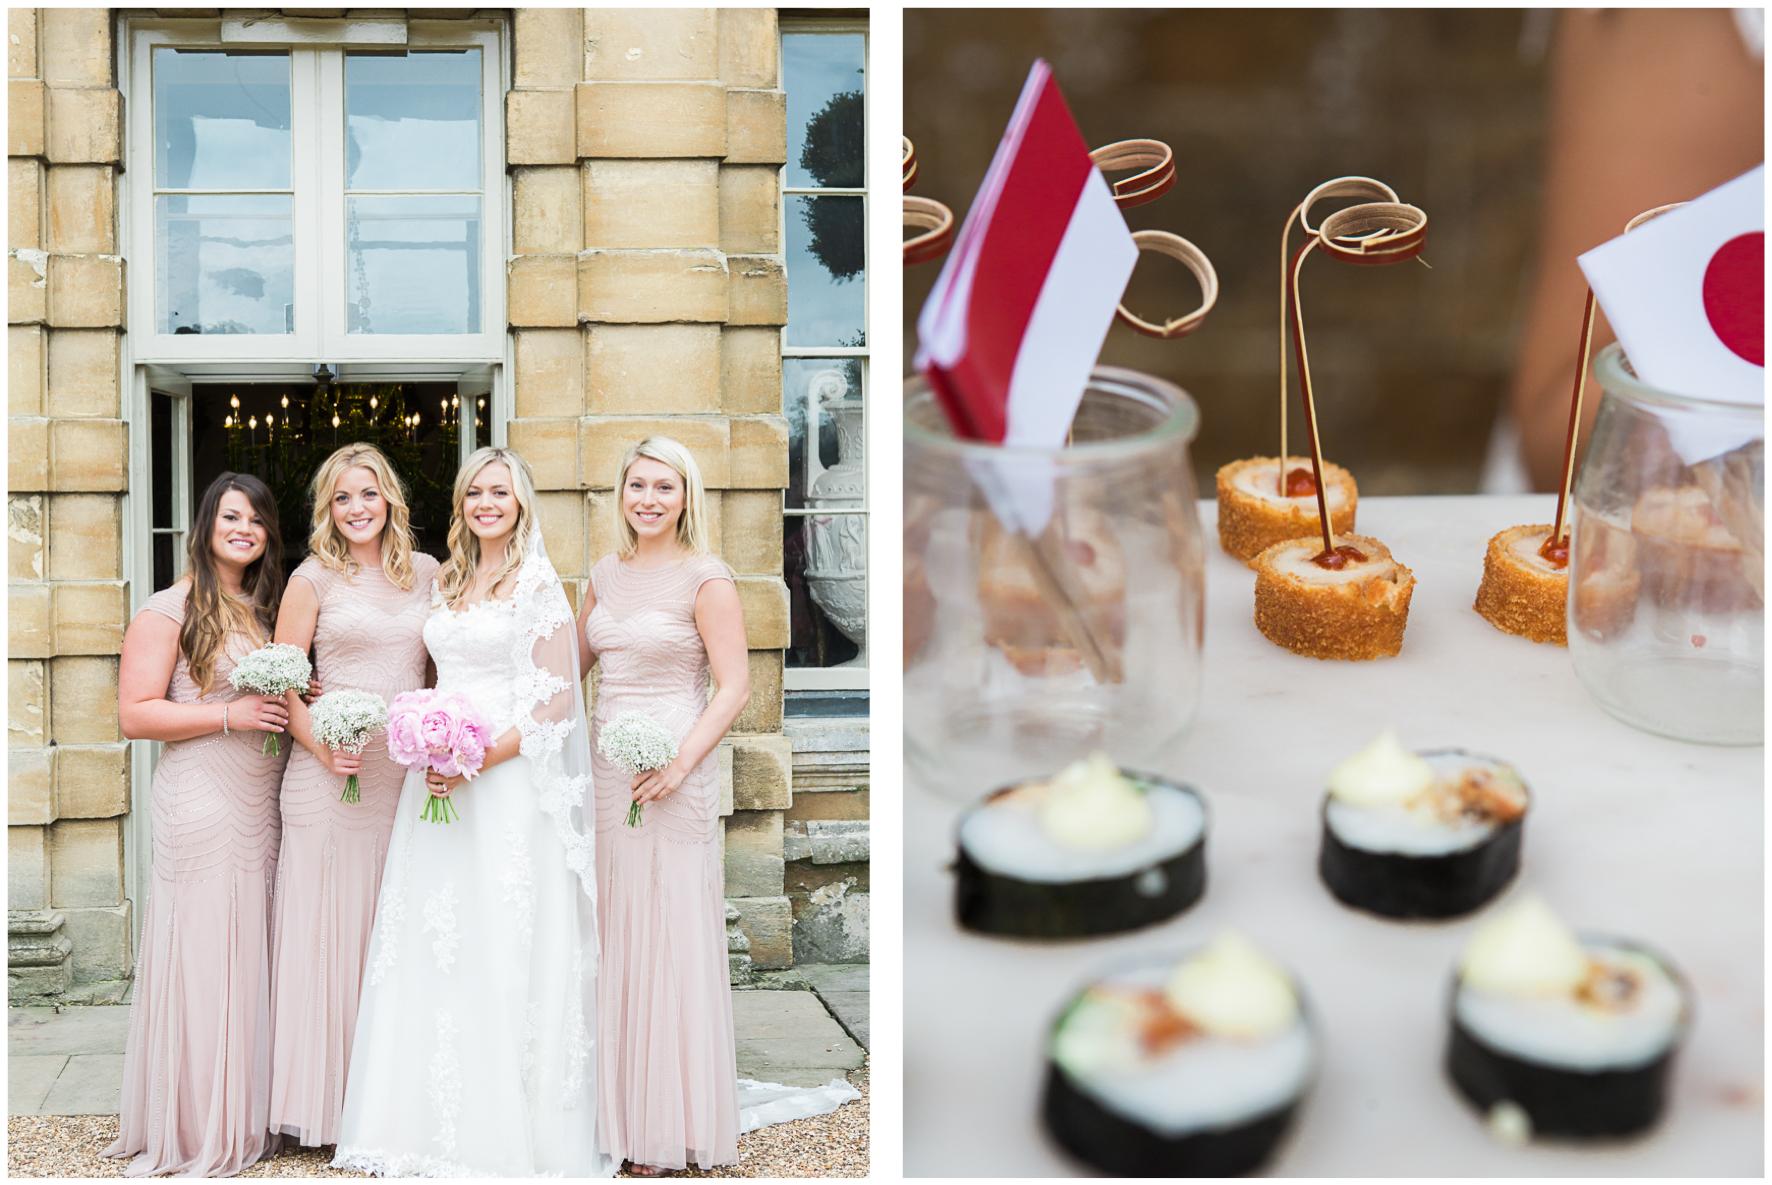 Aynhoe Park orangery, bride with bridesmaids, canapés